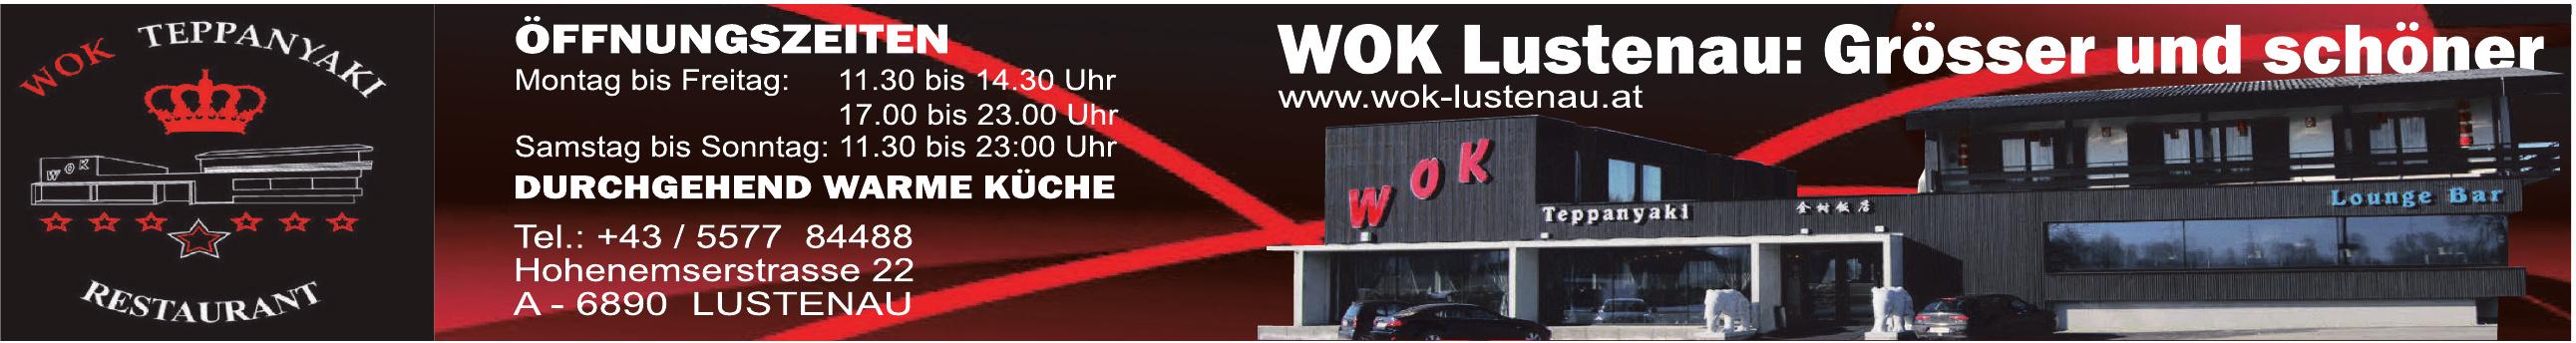 WOK Lustenau: Grösser - Wok Teppanyaki Restaurant